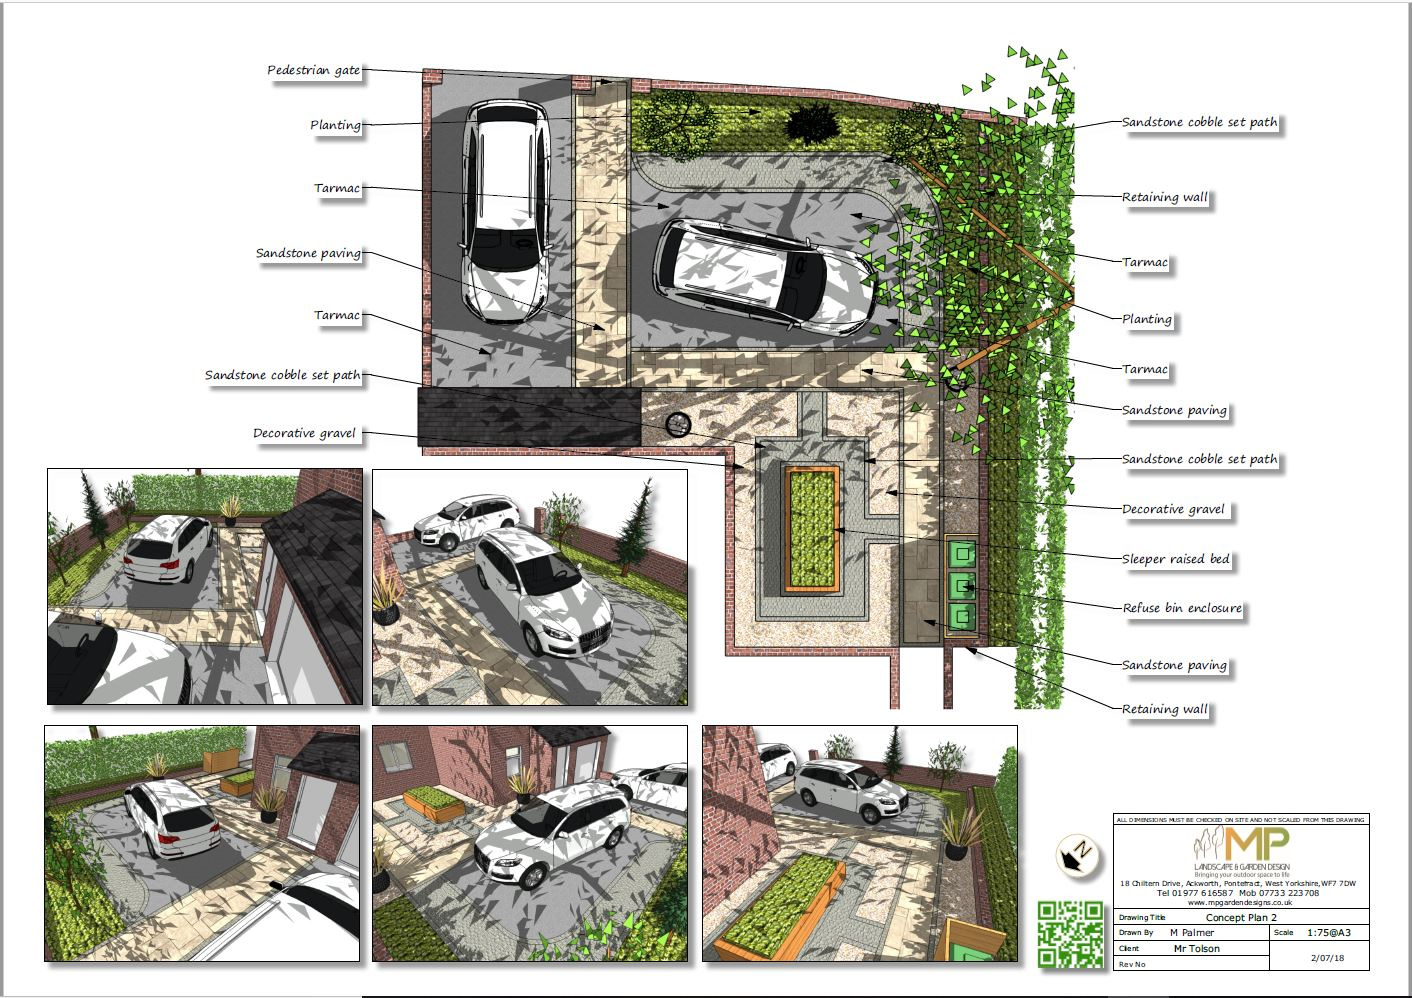 Front garden design concept plan-2 for a property in Kippax.